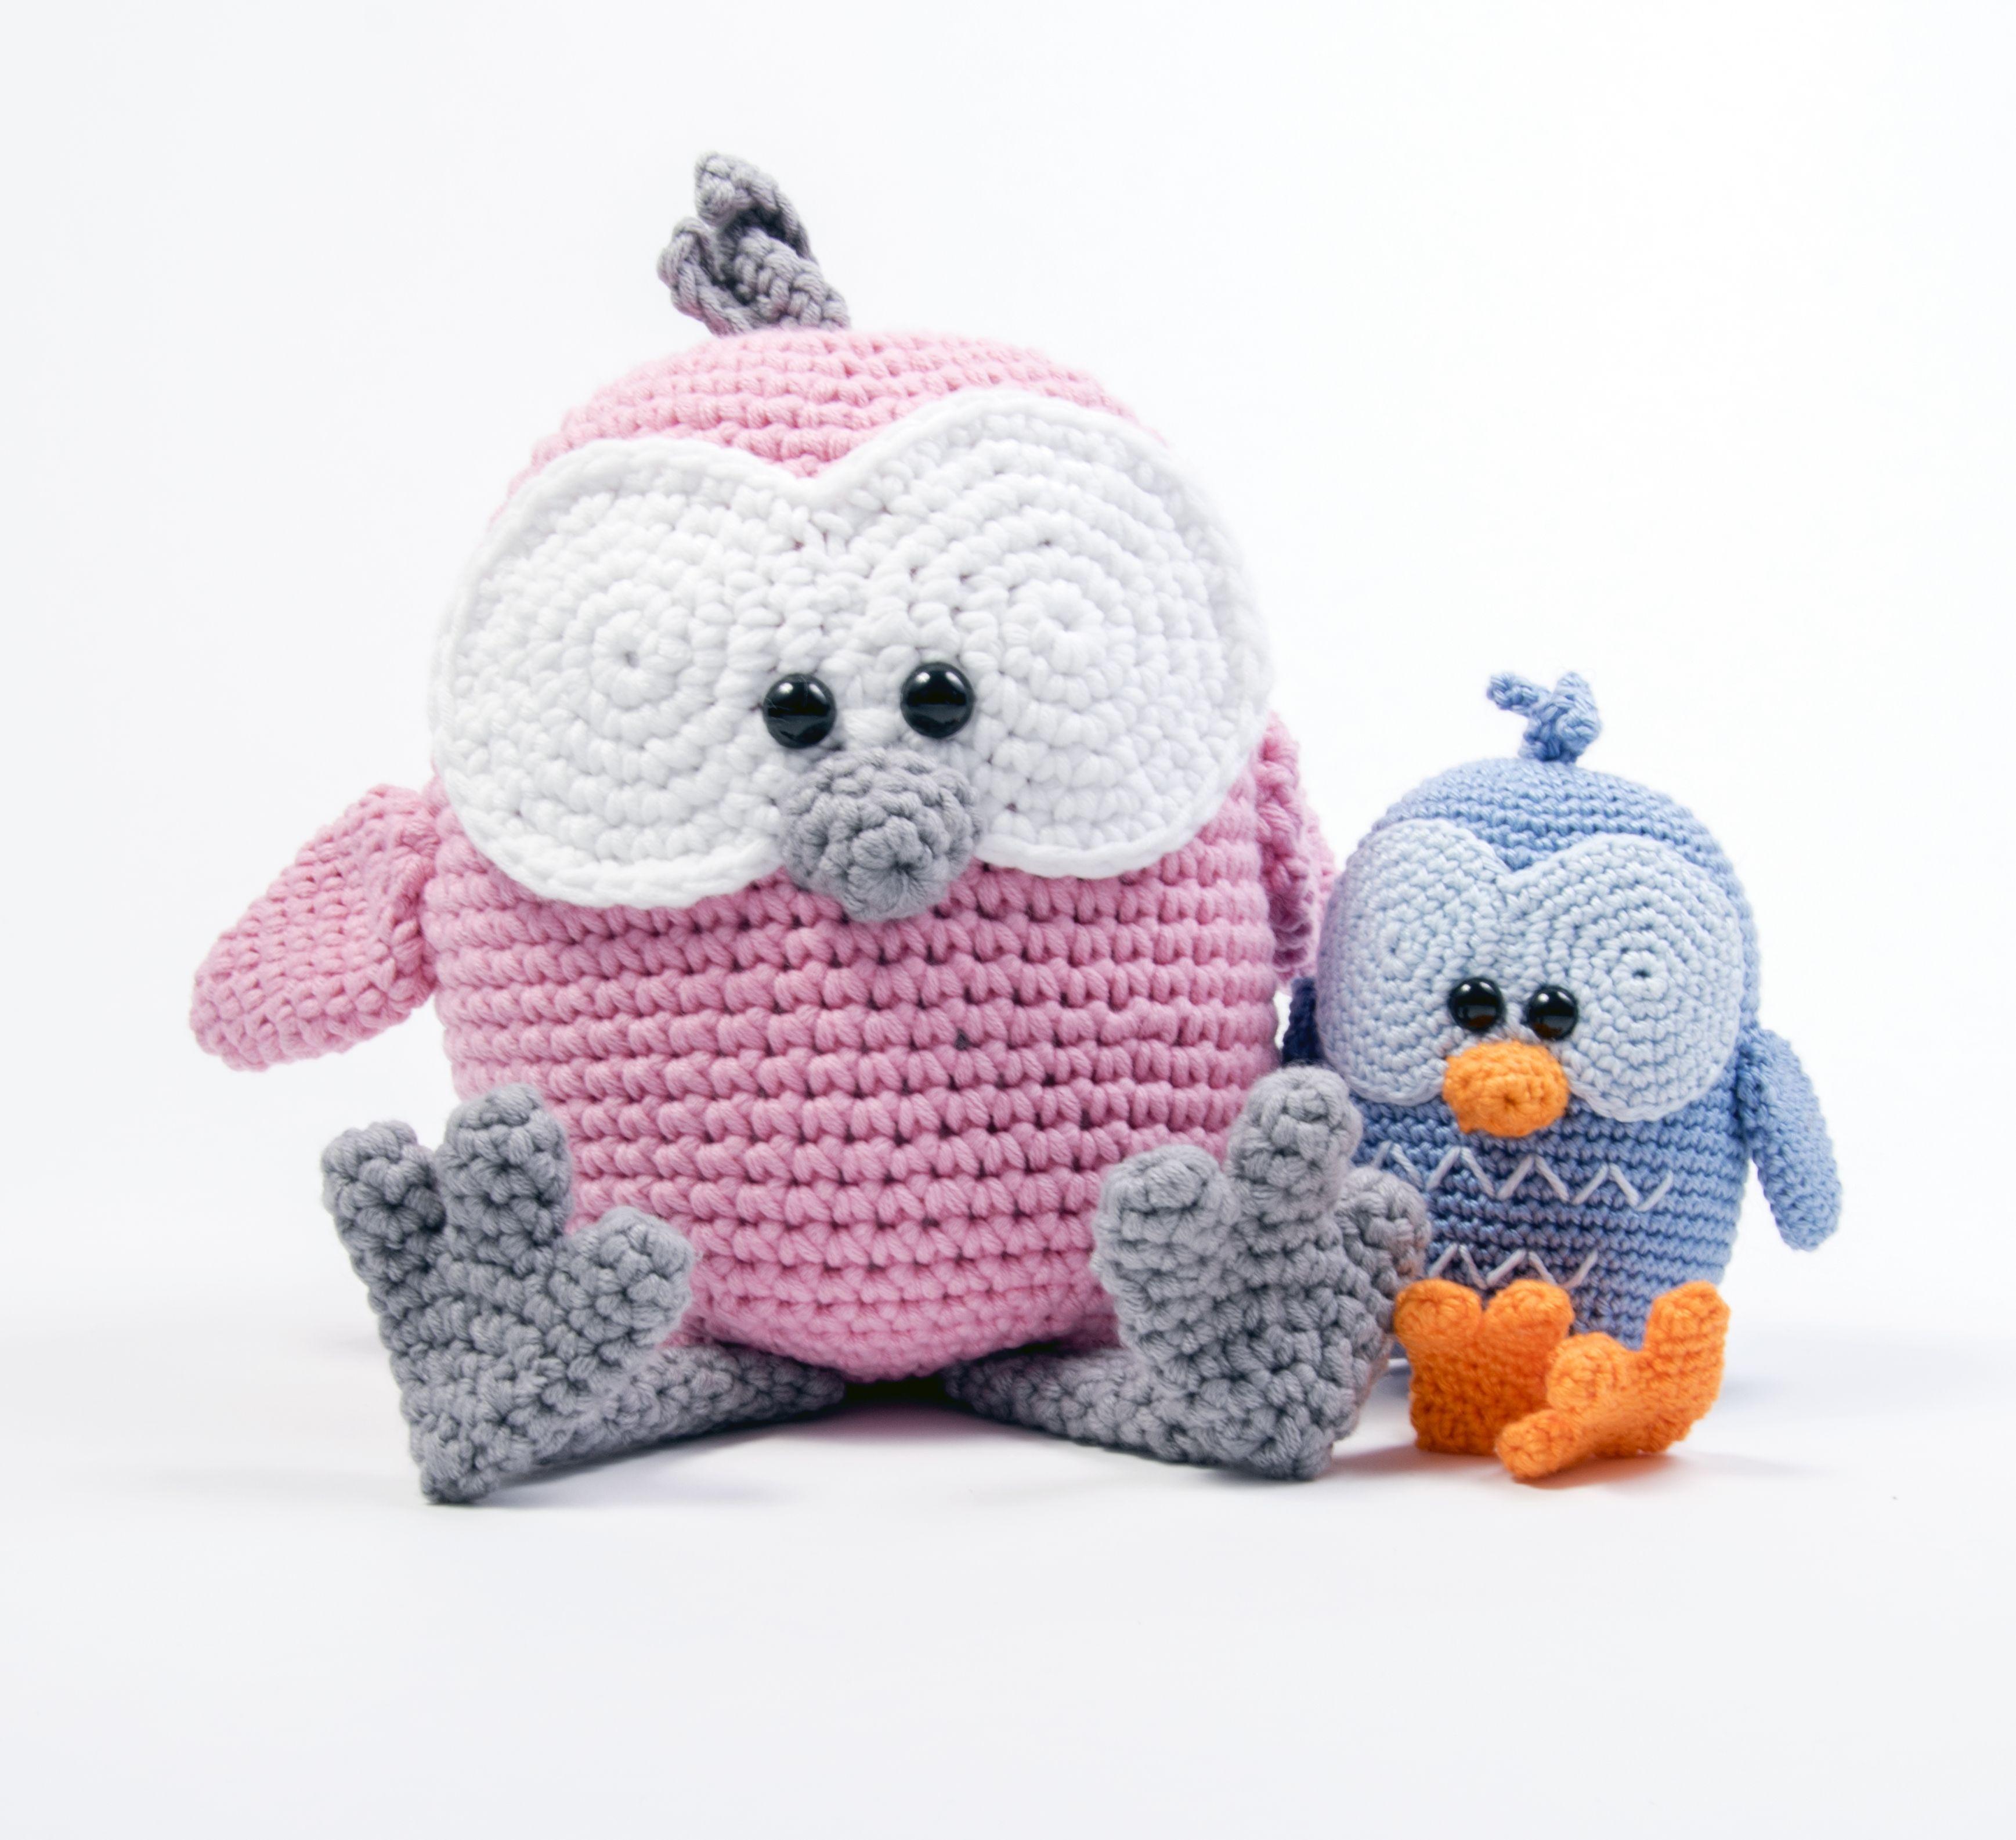 Pin de Pinterest- Ting en Crochet | Pinterest | Decoración